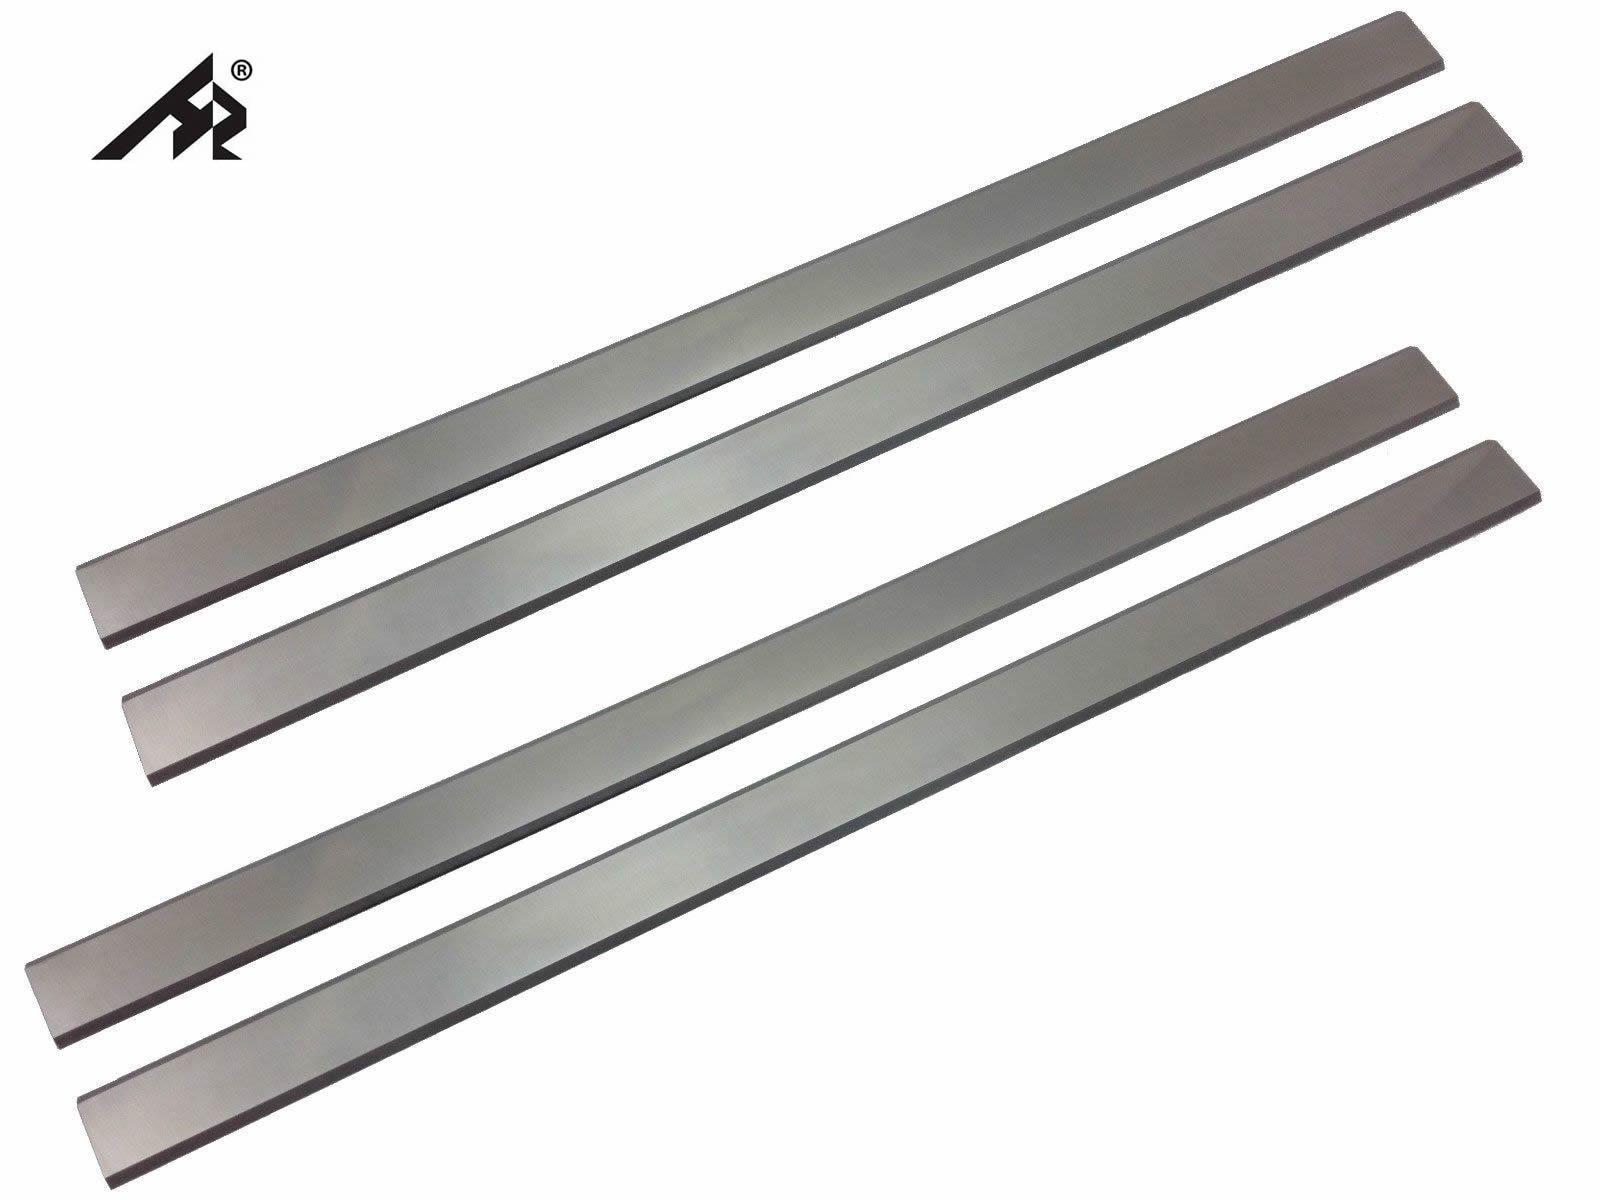 HZ 4pieces 500x25x3mm 20 HSS Planer Blades Knives for Jet 208, Grizzly, Delta, Powermatic 209, Parks, TTL, Sunhill подшипник сферический шариковый lk ucfc207 208 209 210